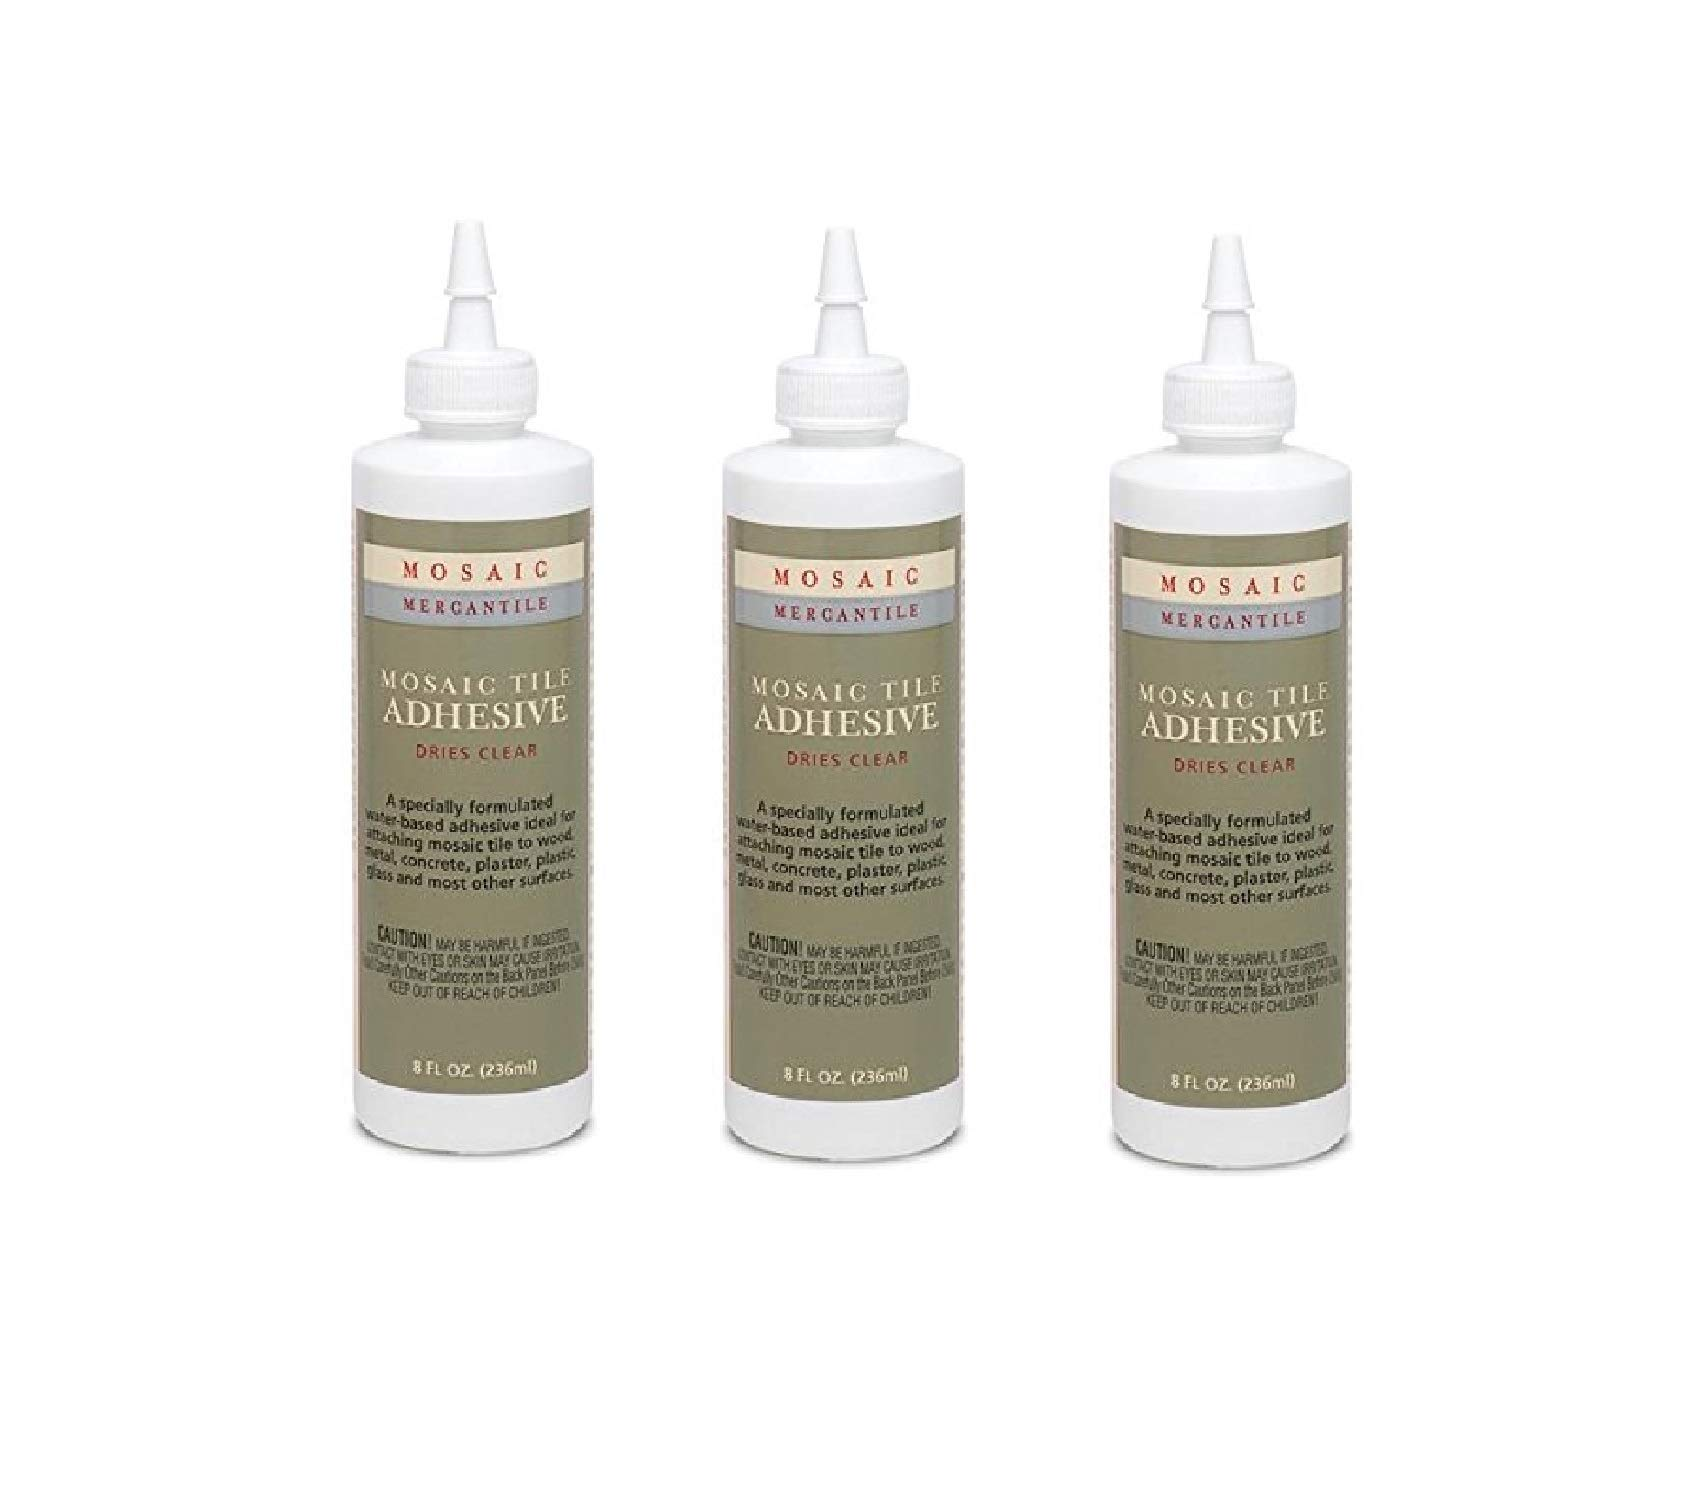 Mosaic Mercantile ADH-8 8-Ounce Adhesive (3 Pack)